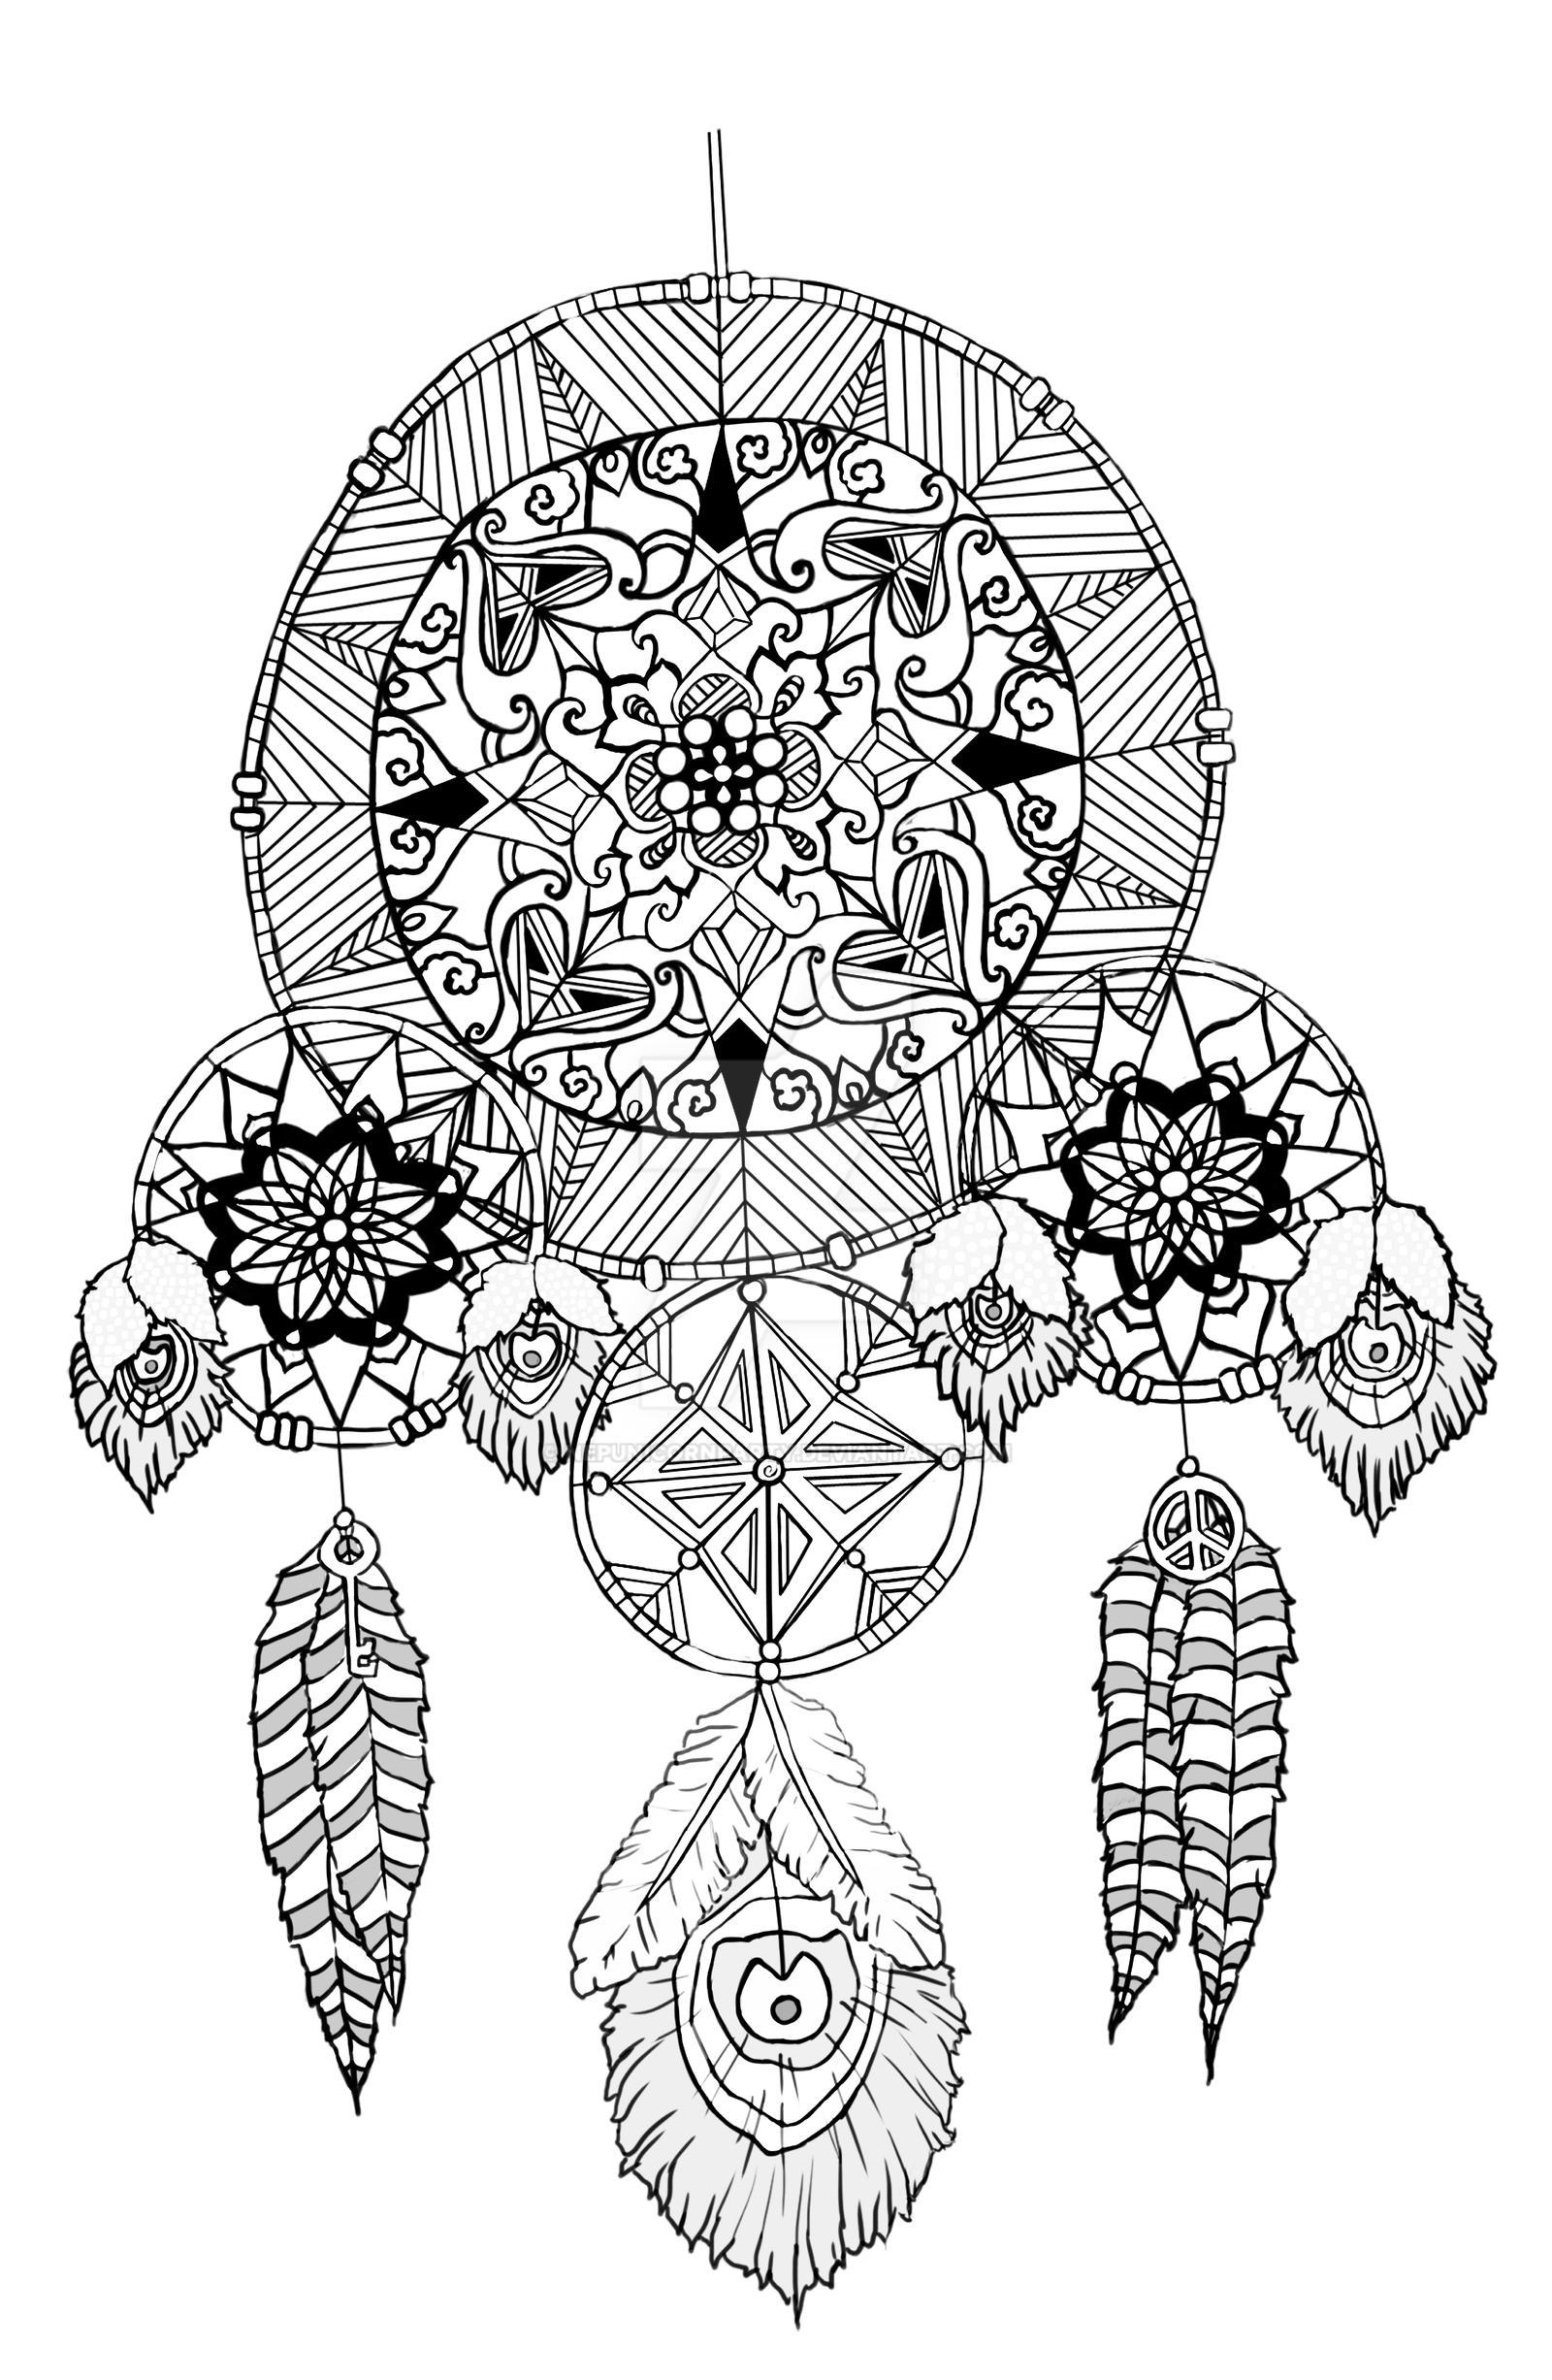 Dream catcher line art by nepunicornparty on deviantart for Dreamcatcher tattoo template